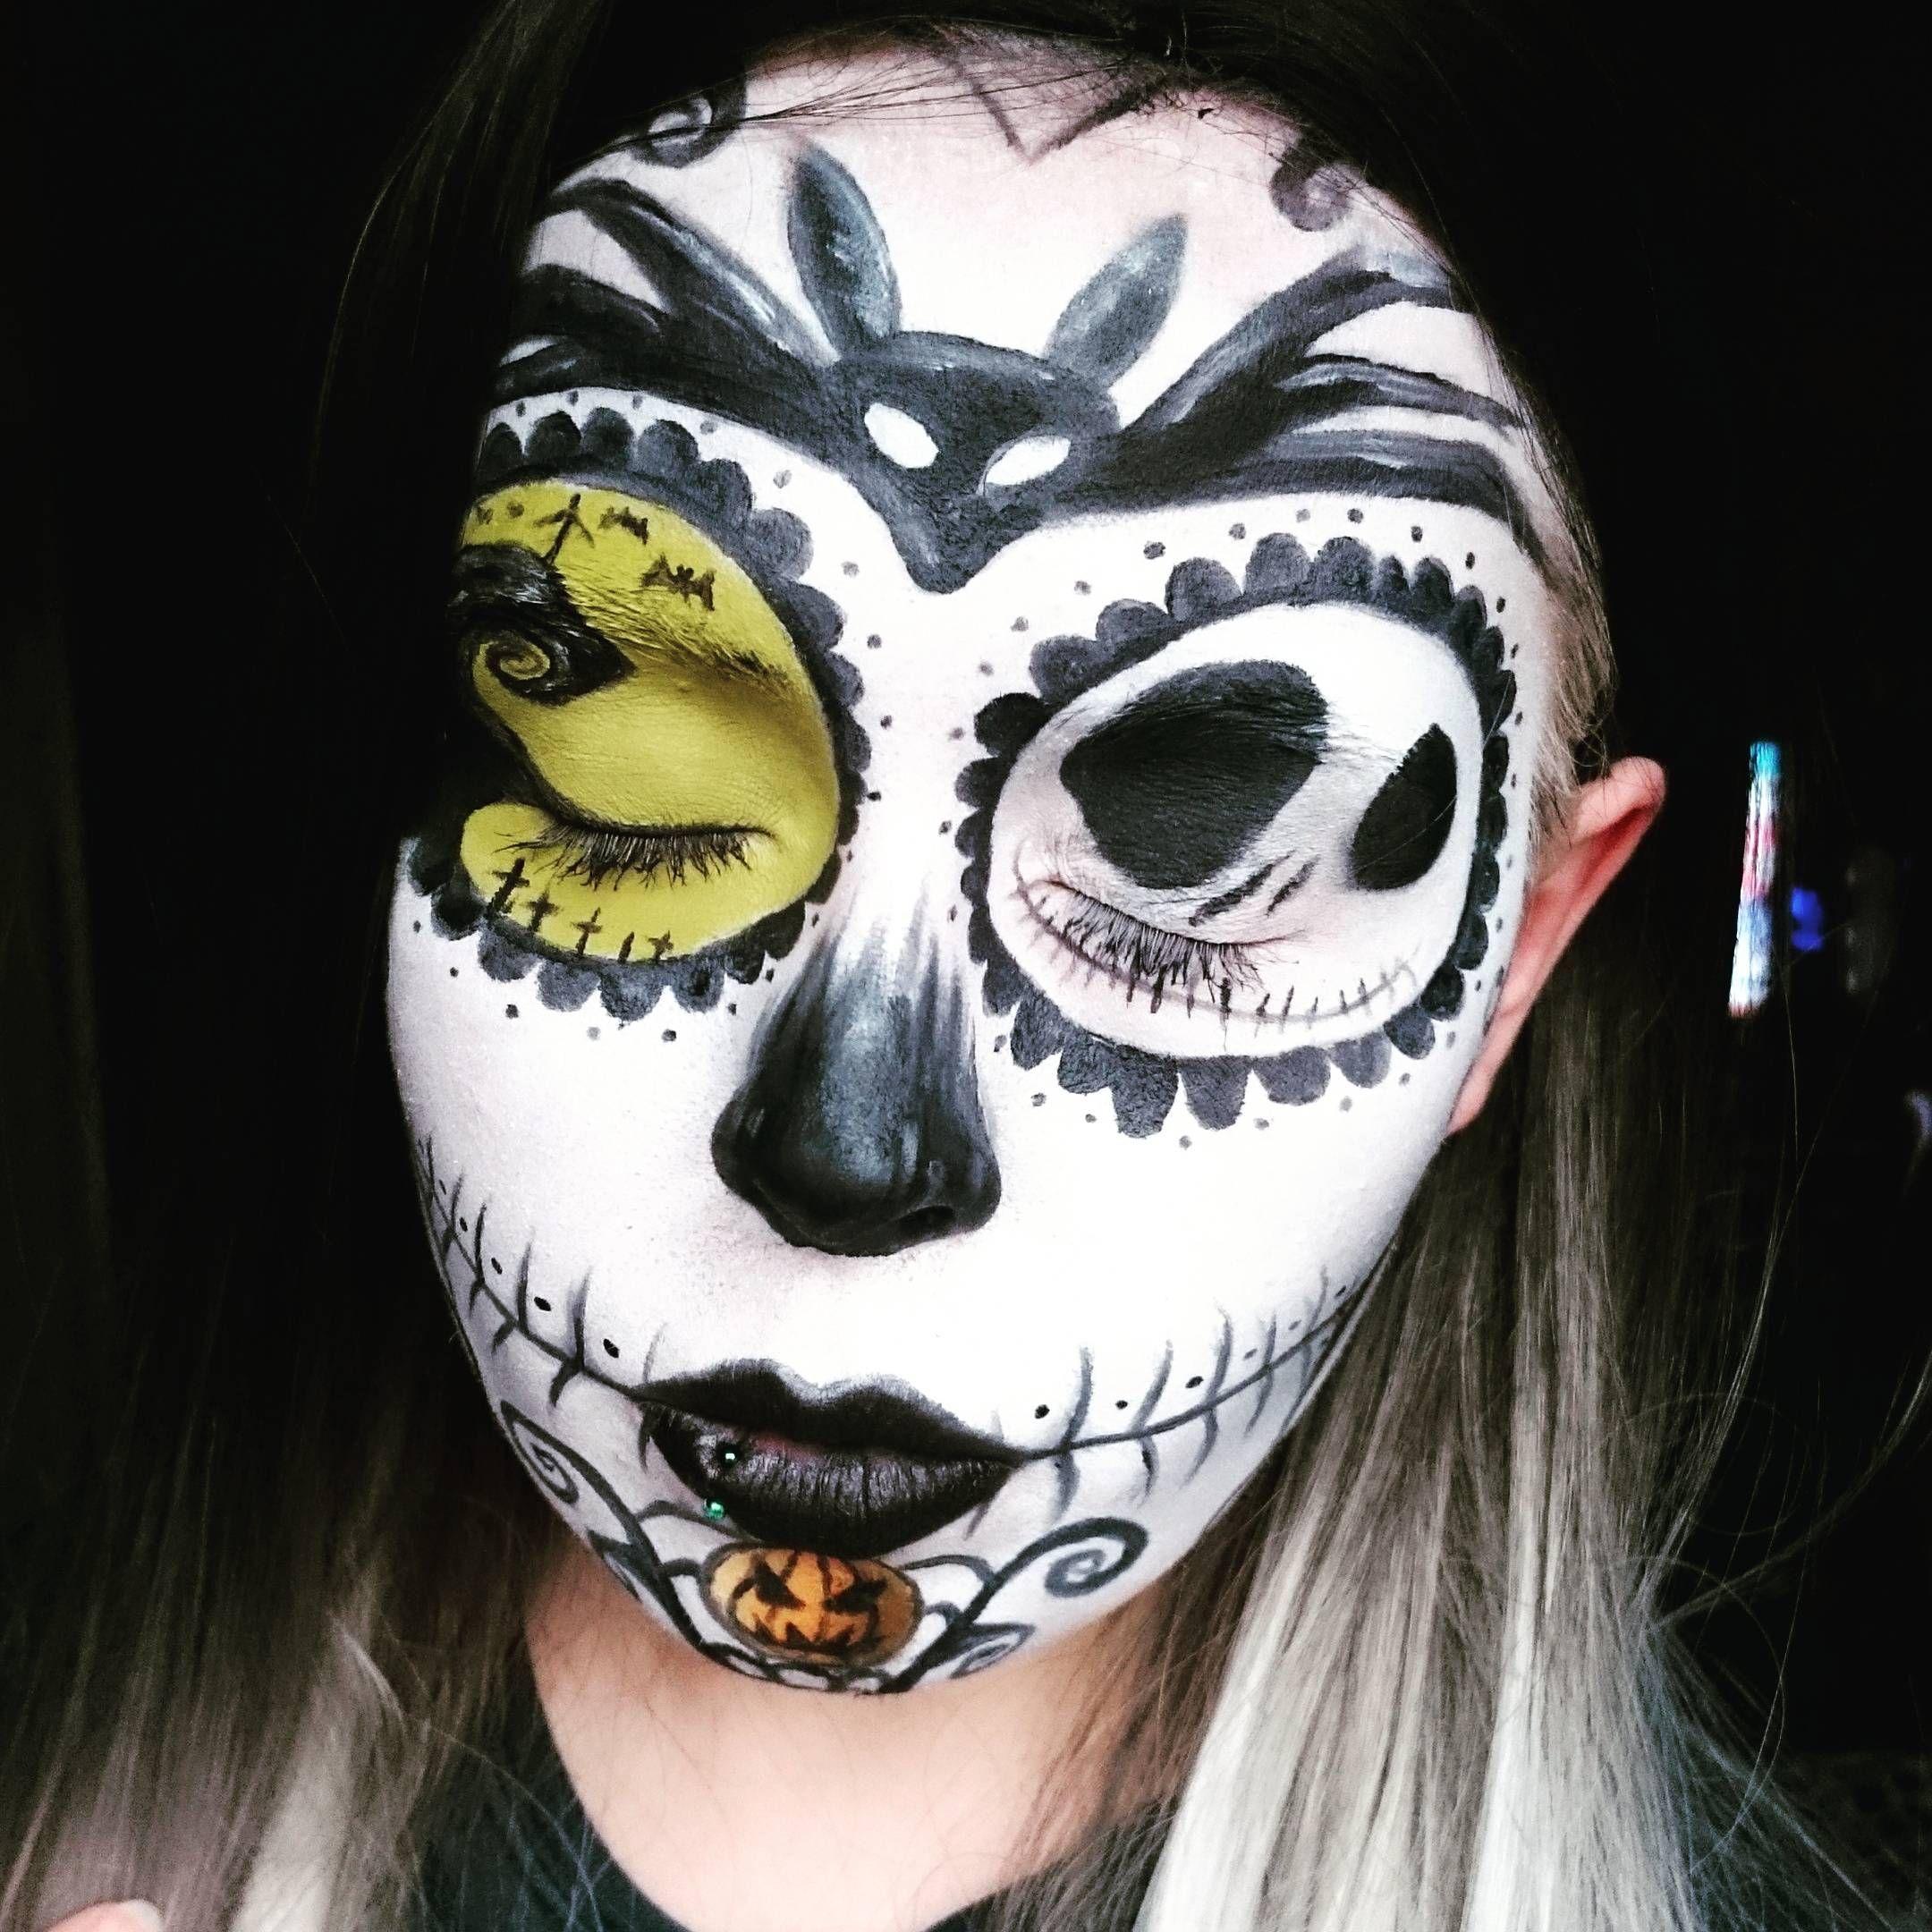 Nightmare before Christmas sugar skull makeup. | Make up | Pinterest ...